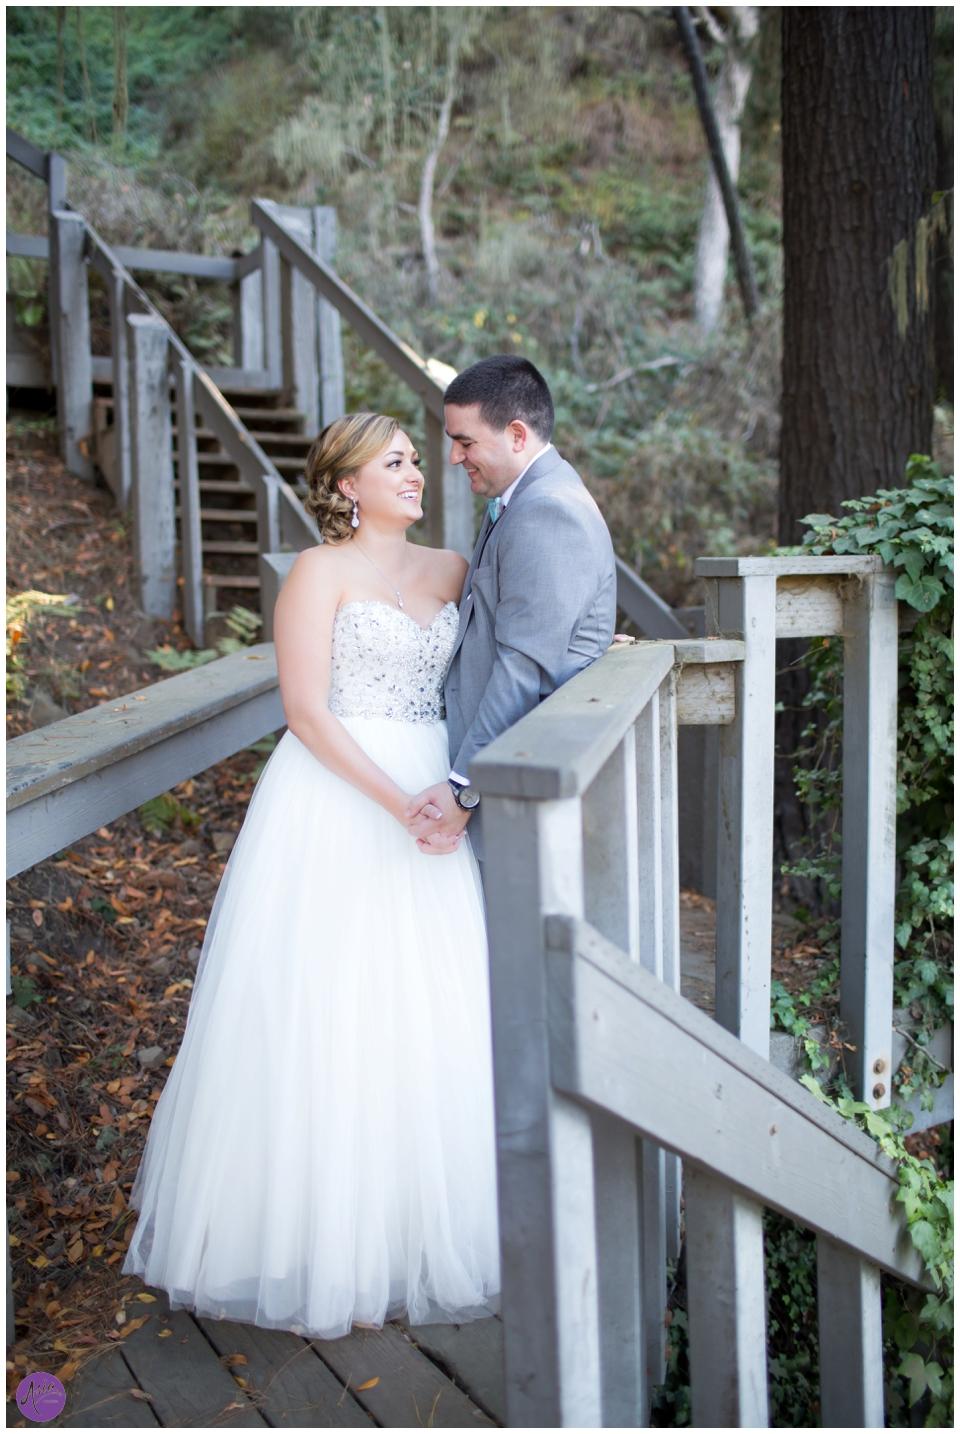 Wedding Photographer Asia Croson Photography San Luis Obispo-0772_Asia Croson Photography stomped.jpg